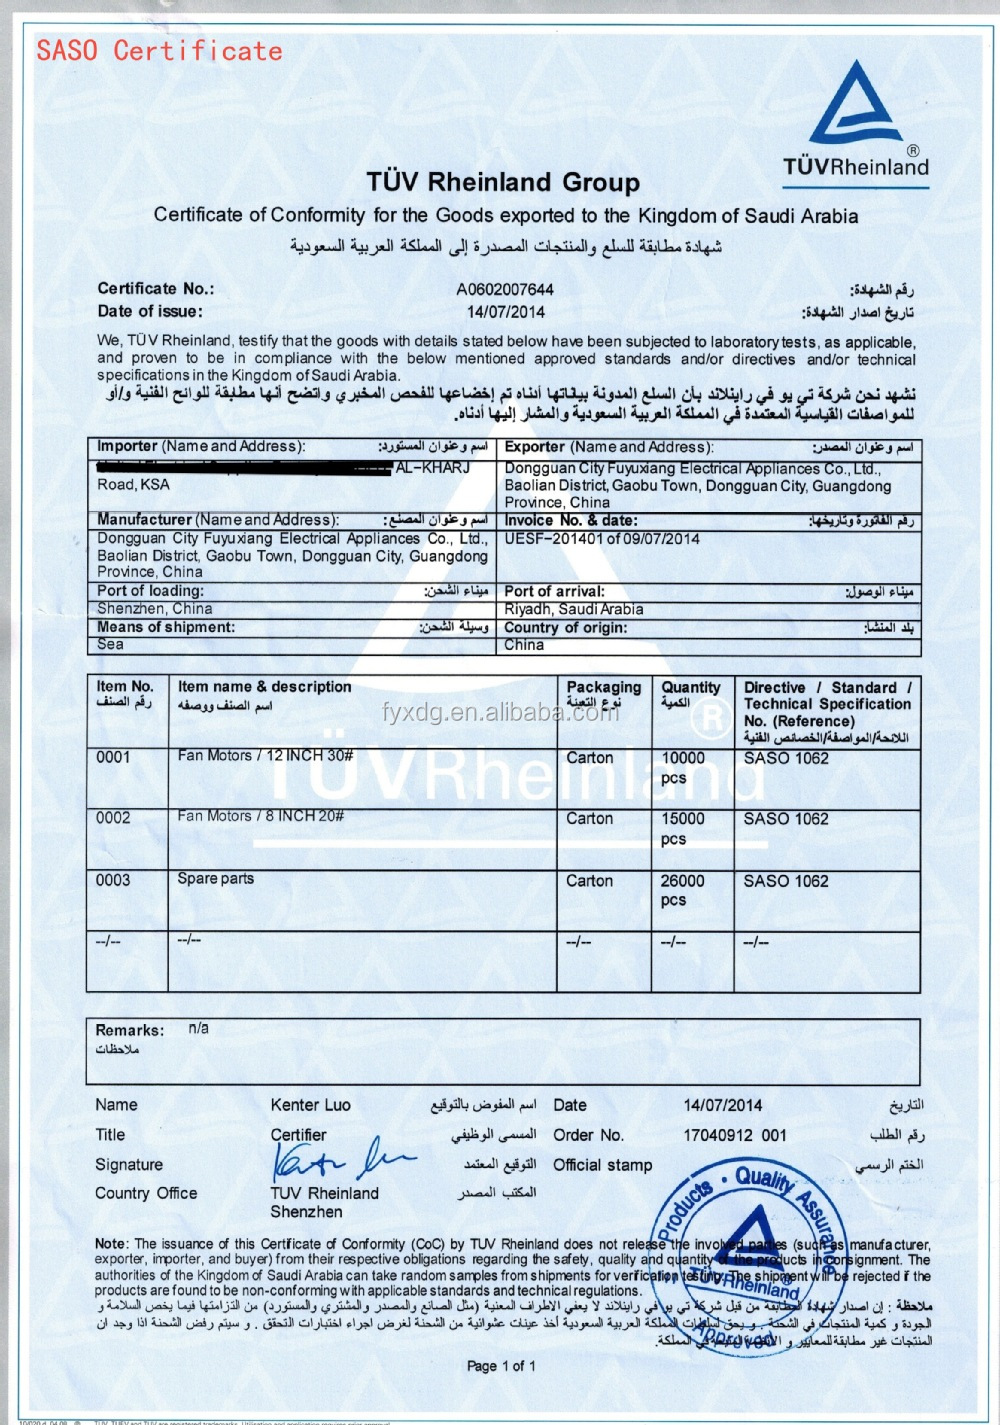 Exhaust Fan With Saso Certificate 6 Quot 8 Quot 10 Quot 12 Quot Exhaust